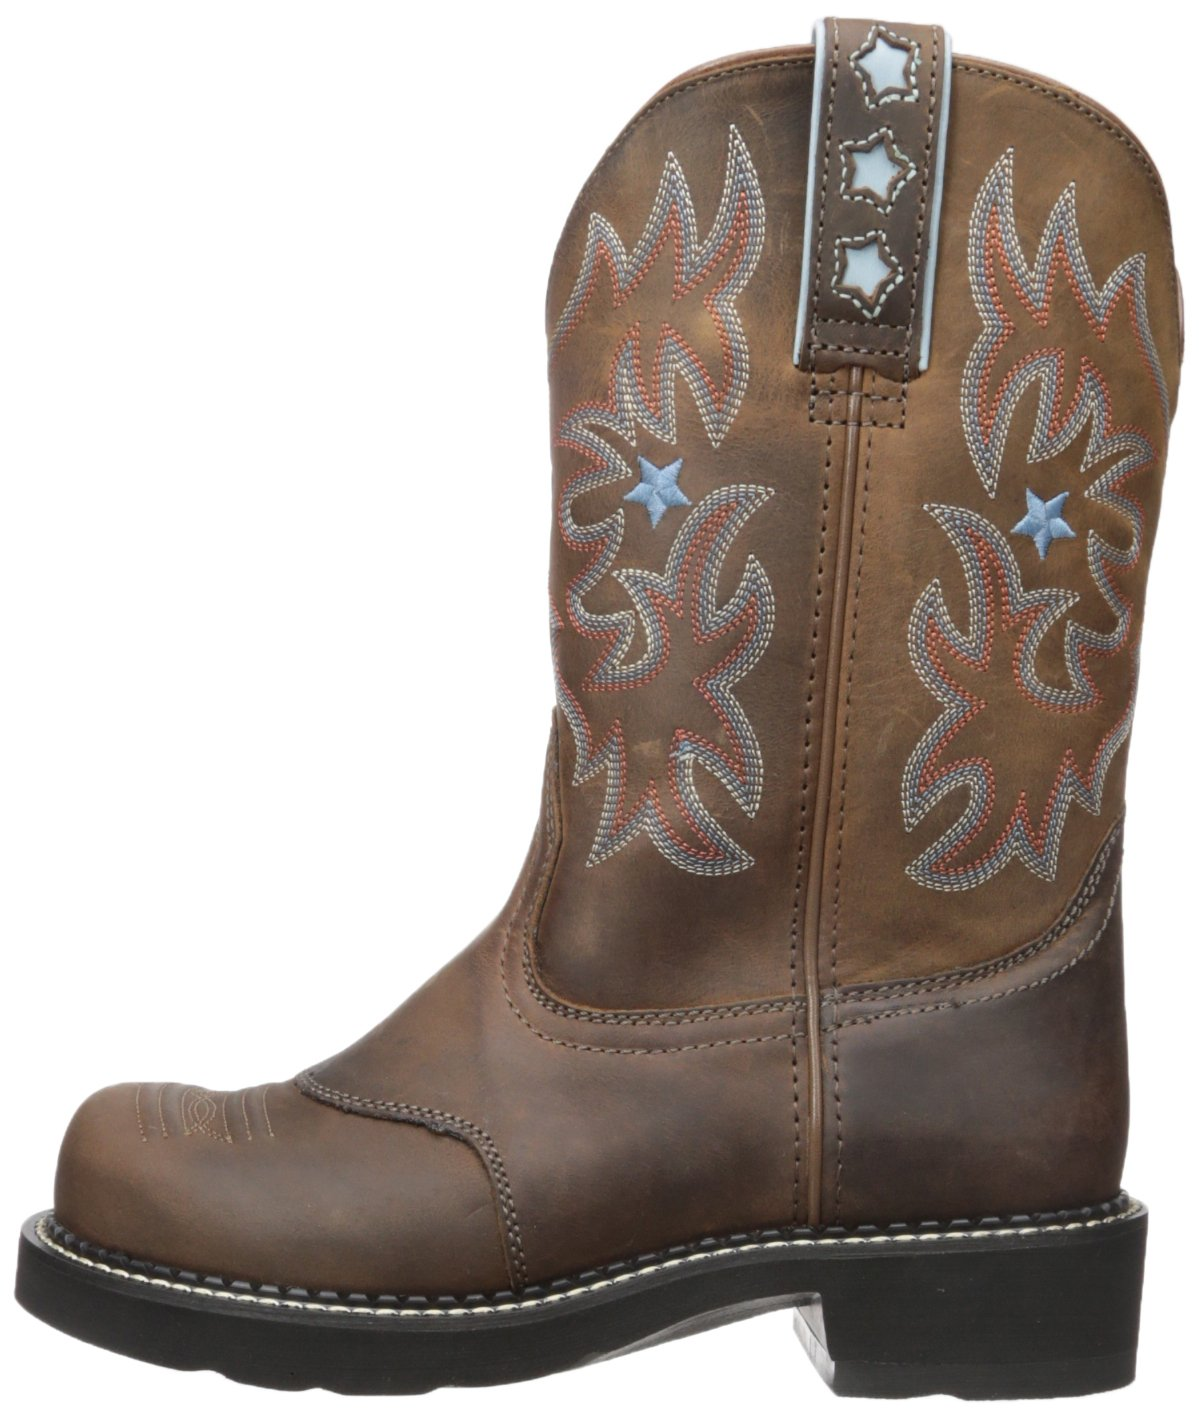 Ariat Women's Probaby Western Cowboy Boot B000I3UYLO 9 C US|Driftwood Brown